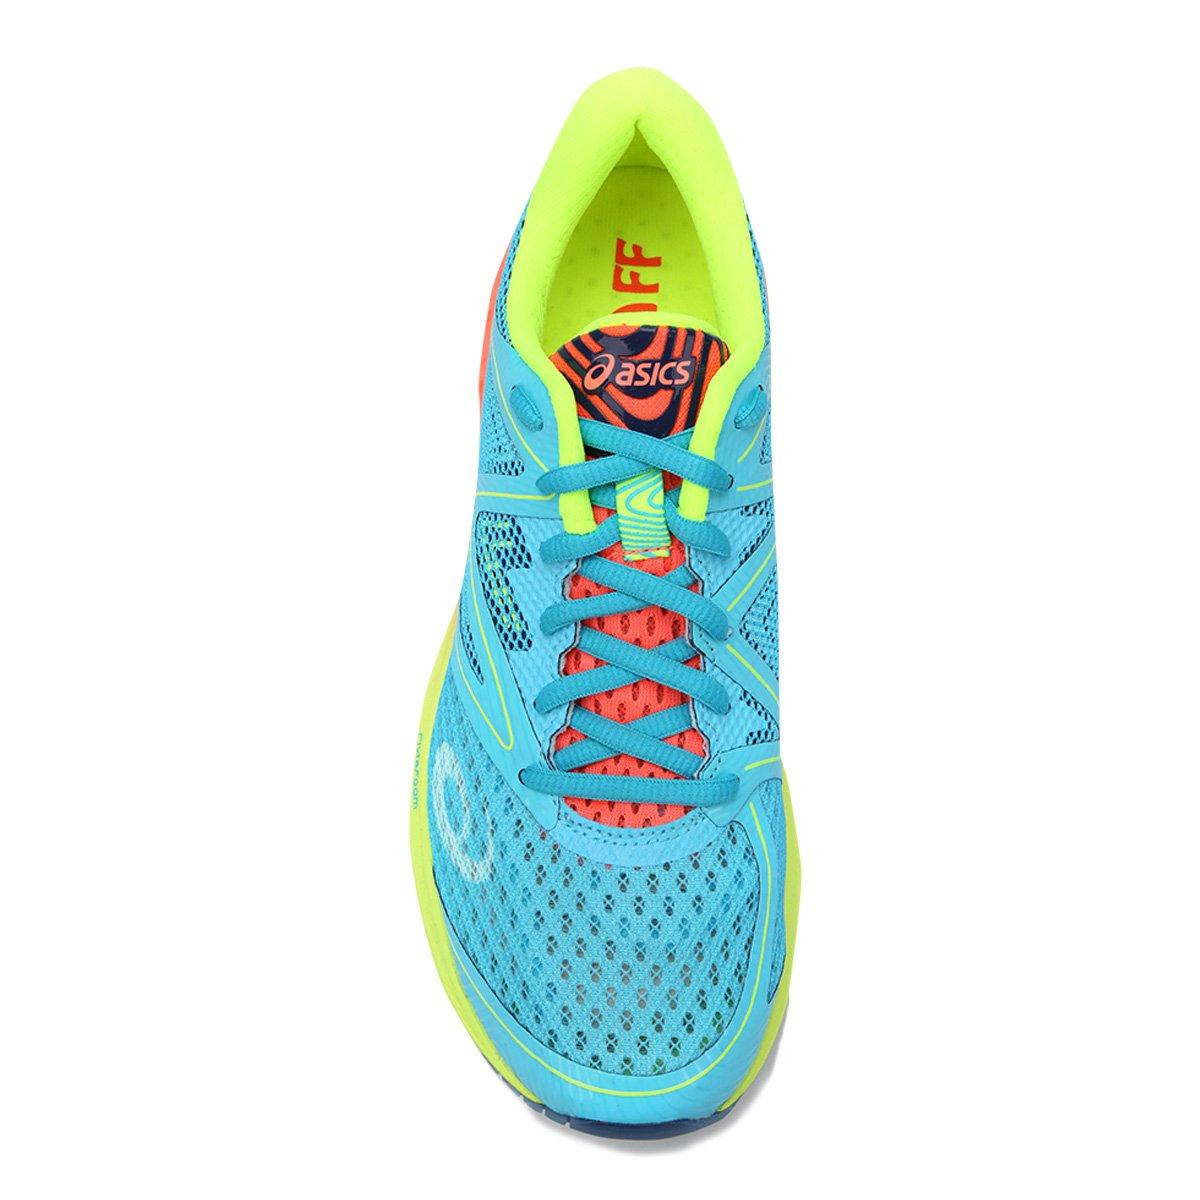 4717a87286 Tênis Asics Gel Noosa FF Feminino - Azul Piscina e Laranja - Compre ...